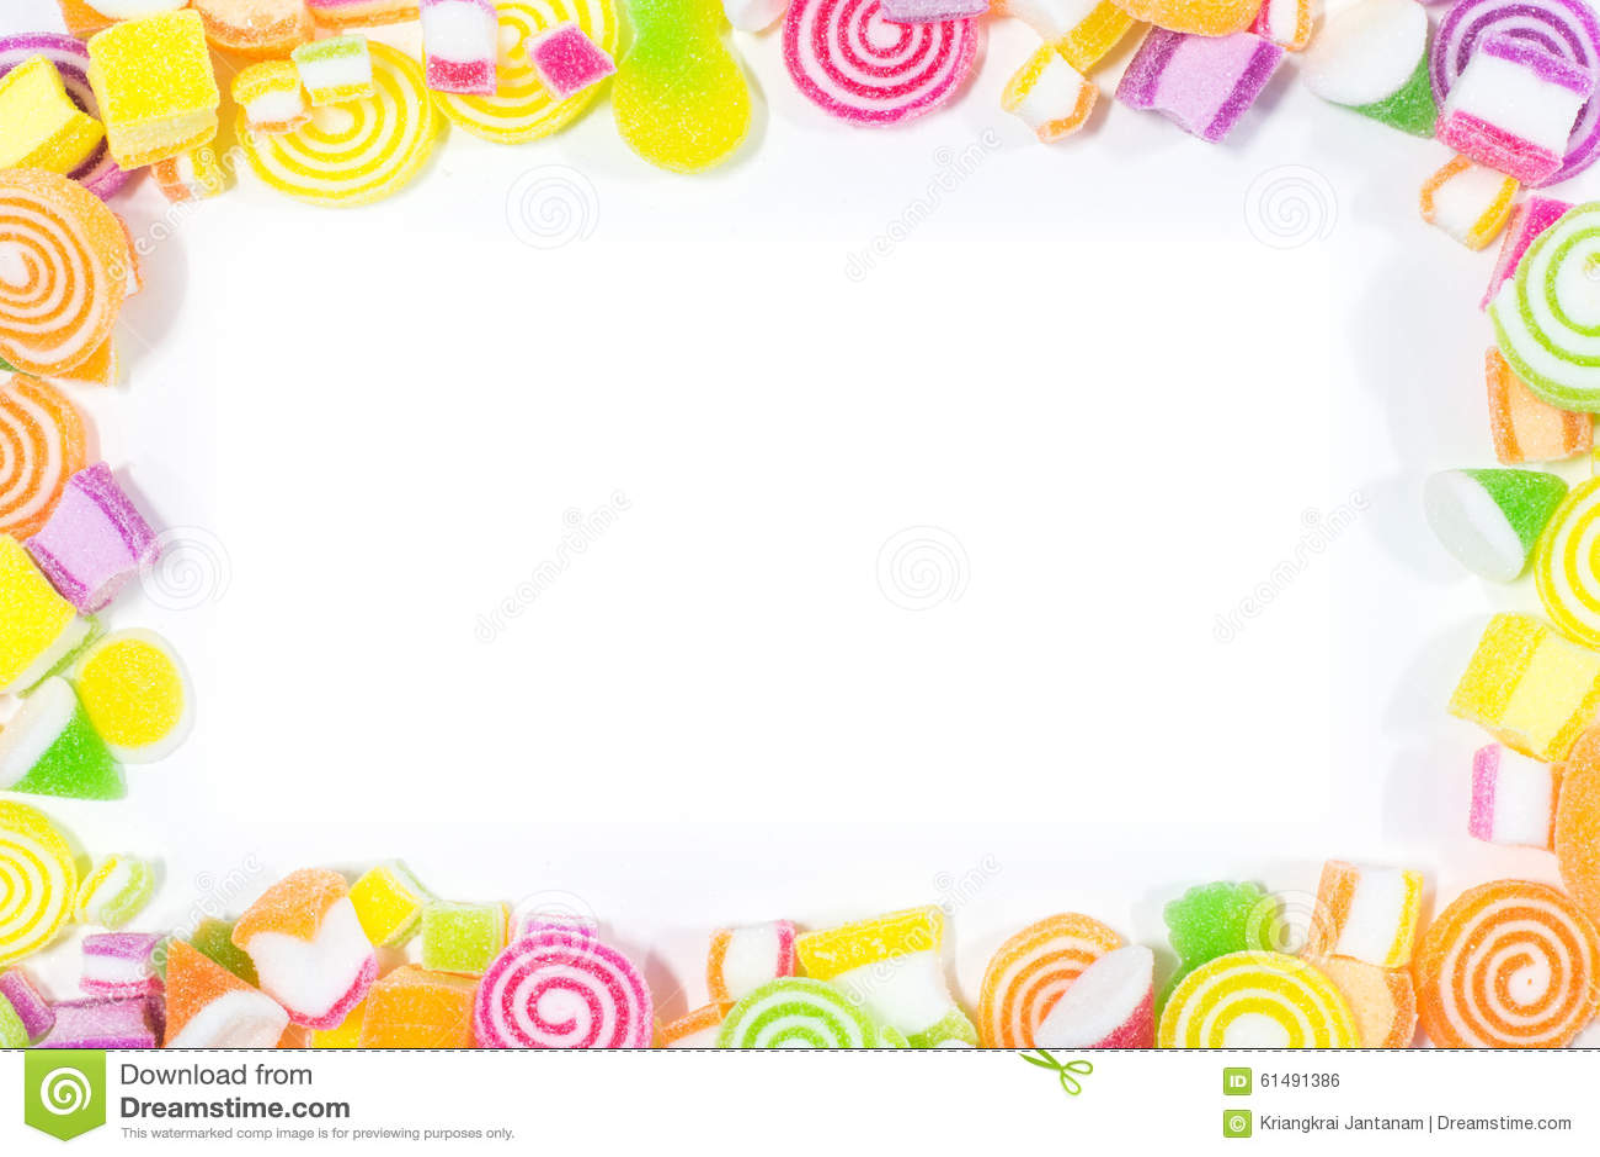 Marsmellow有凝胶甜点背景